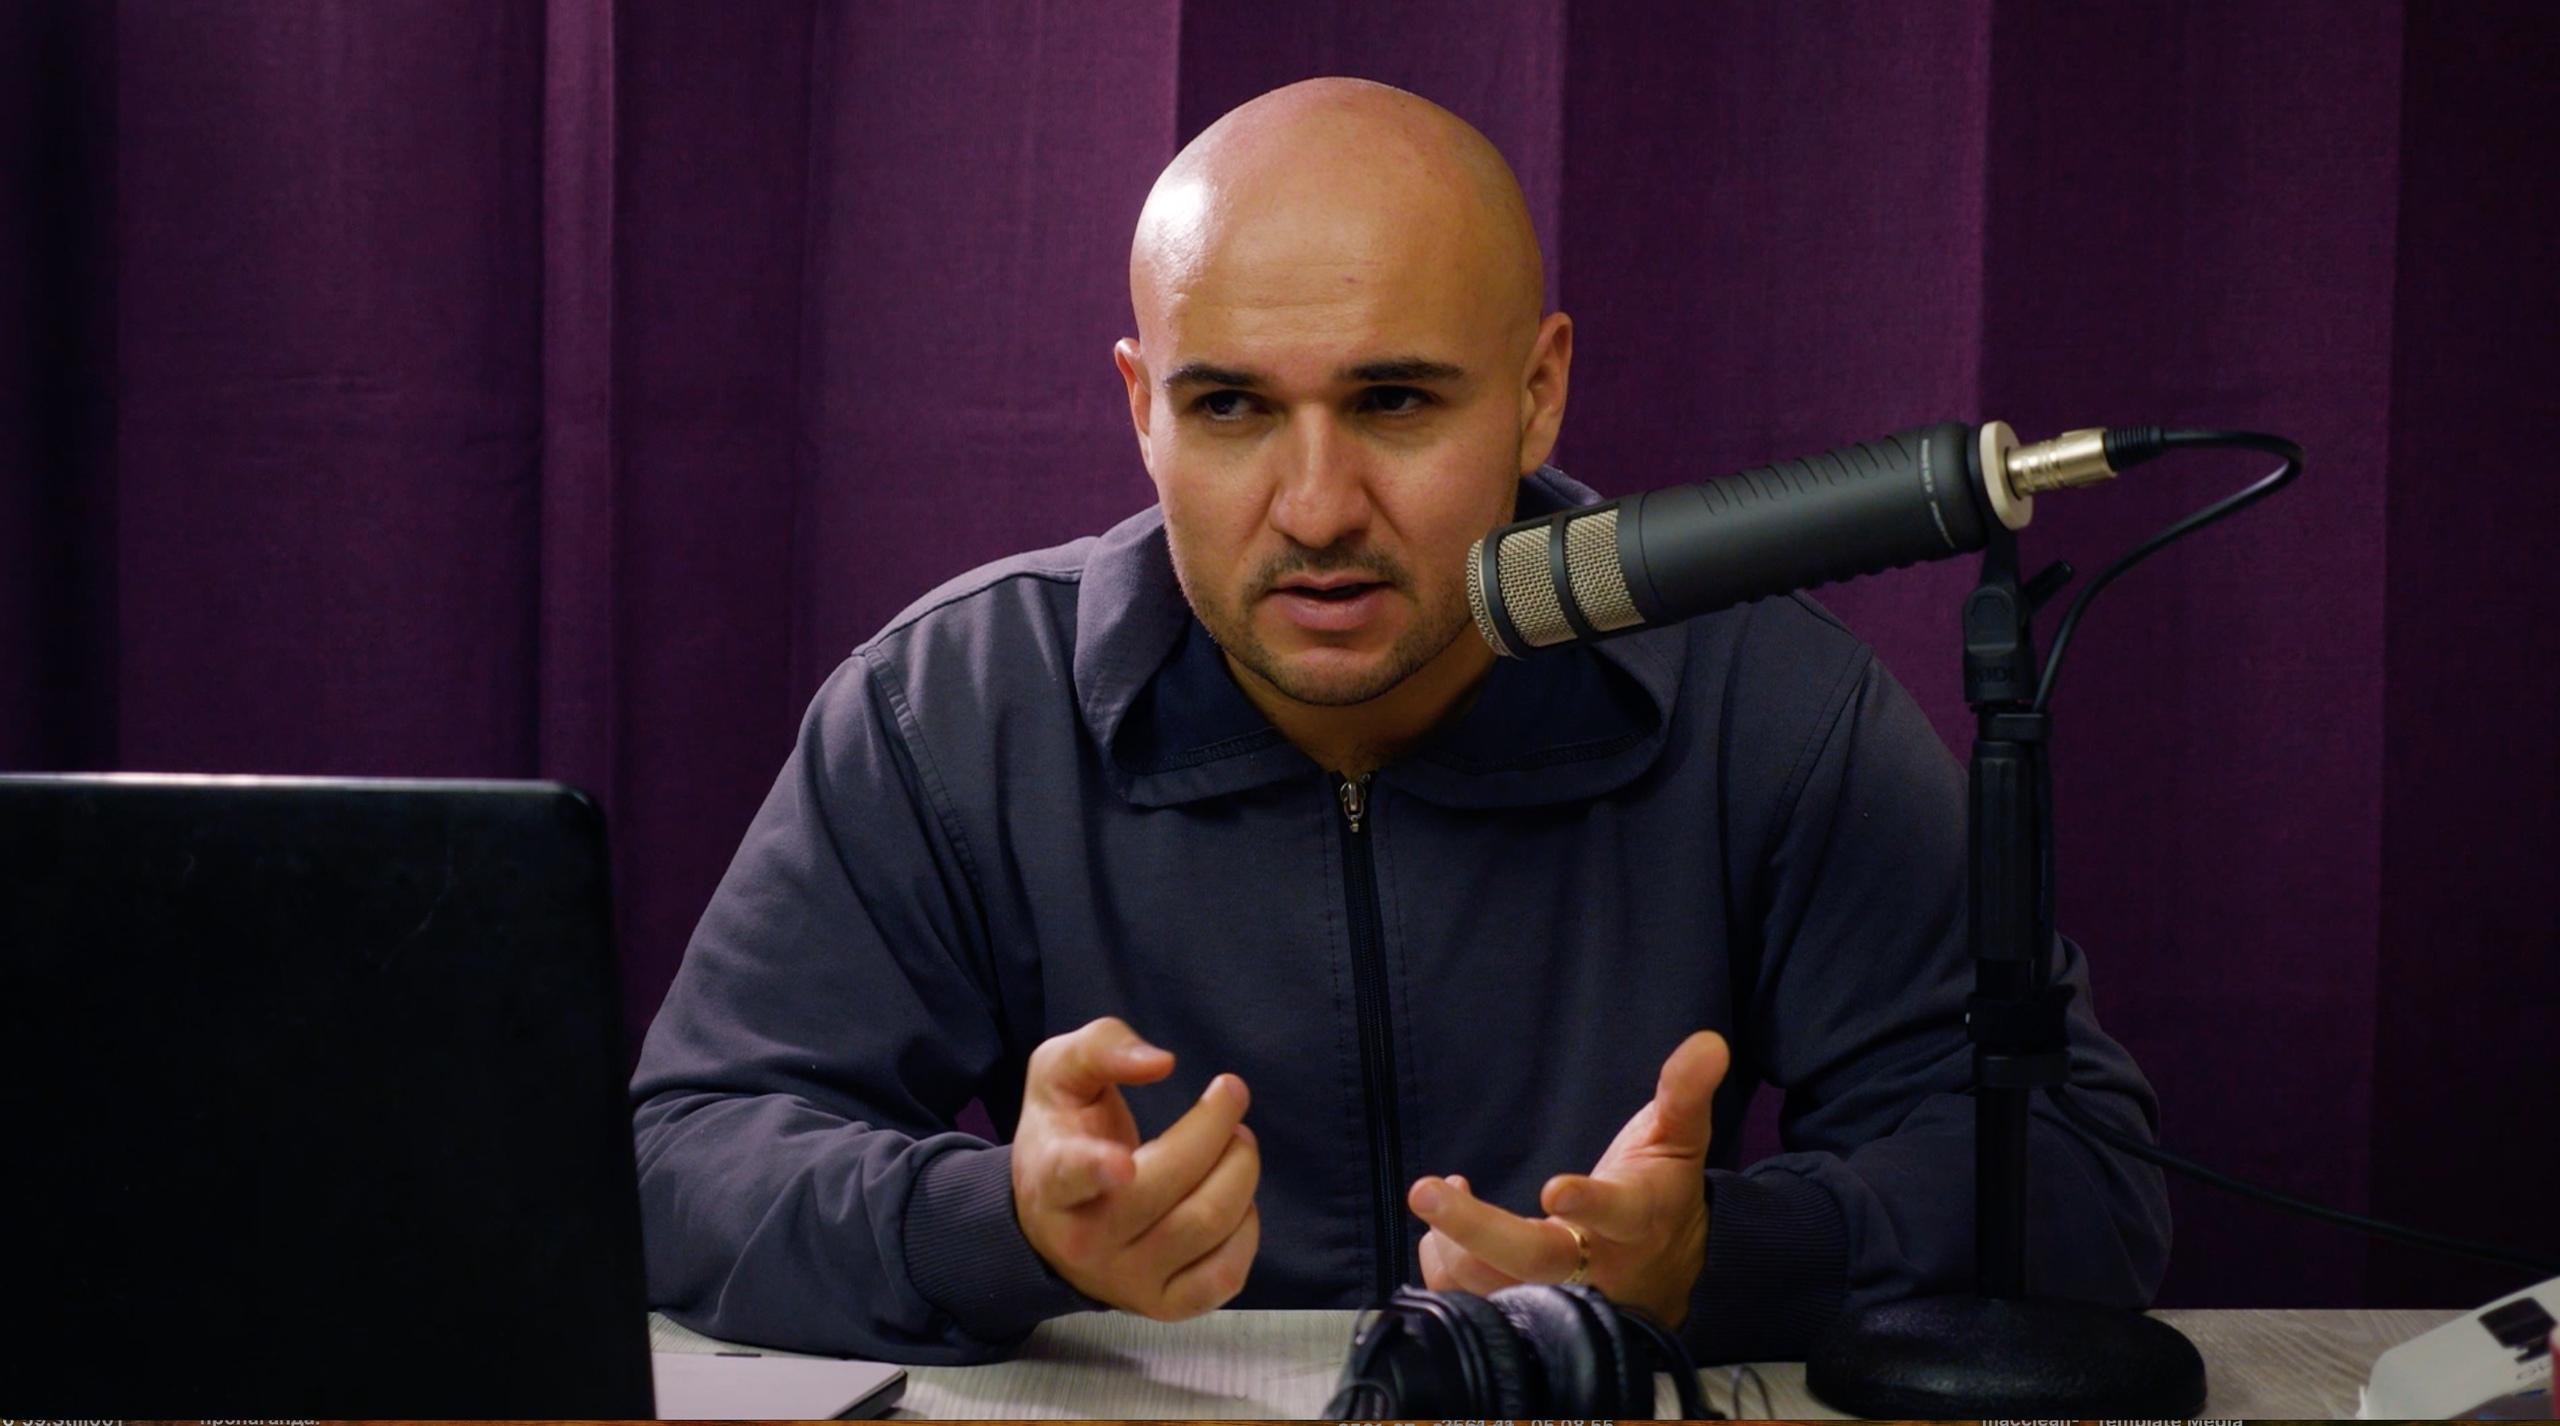 Назар Илишев: биография автора YouTube канала «ВДУМЧИВО ОБО ВСЕМ»